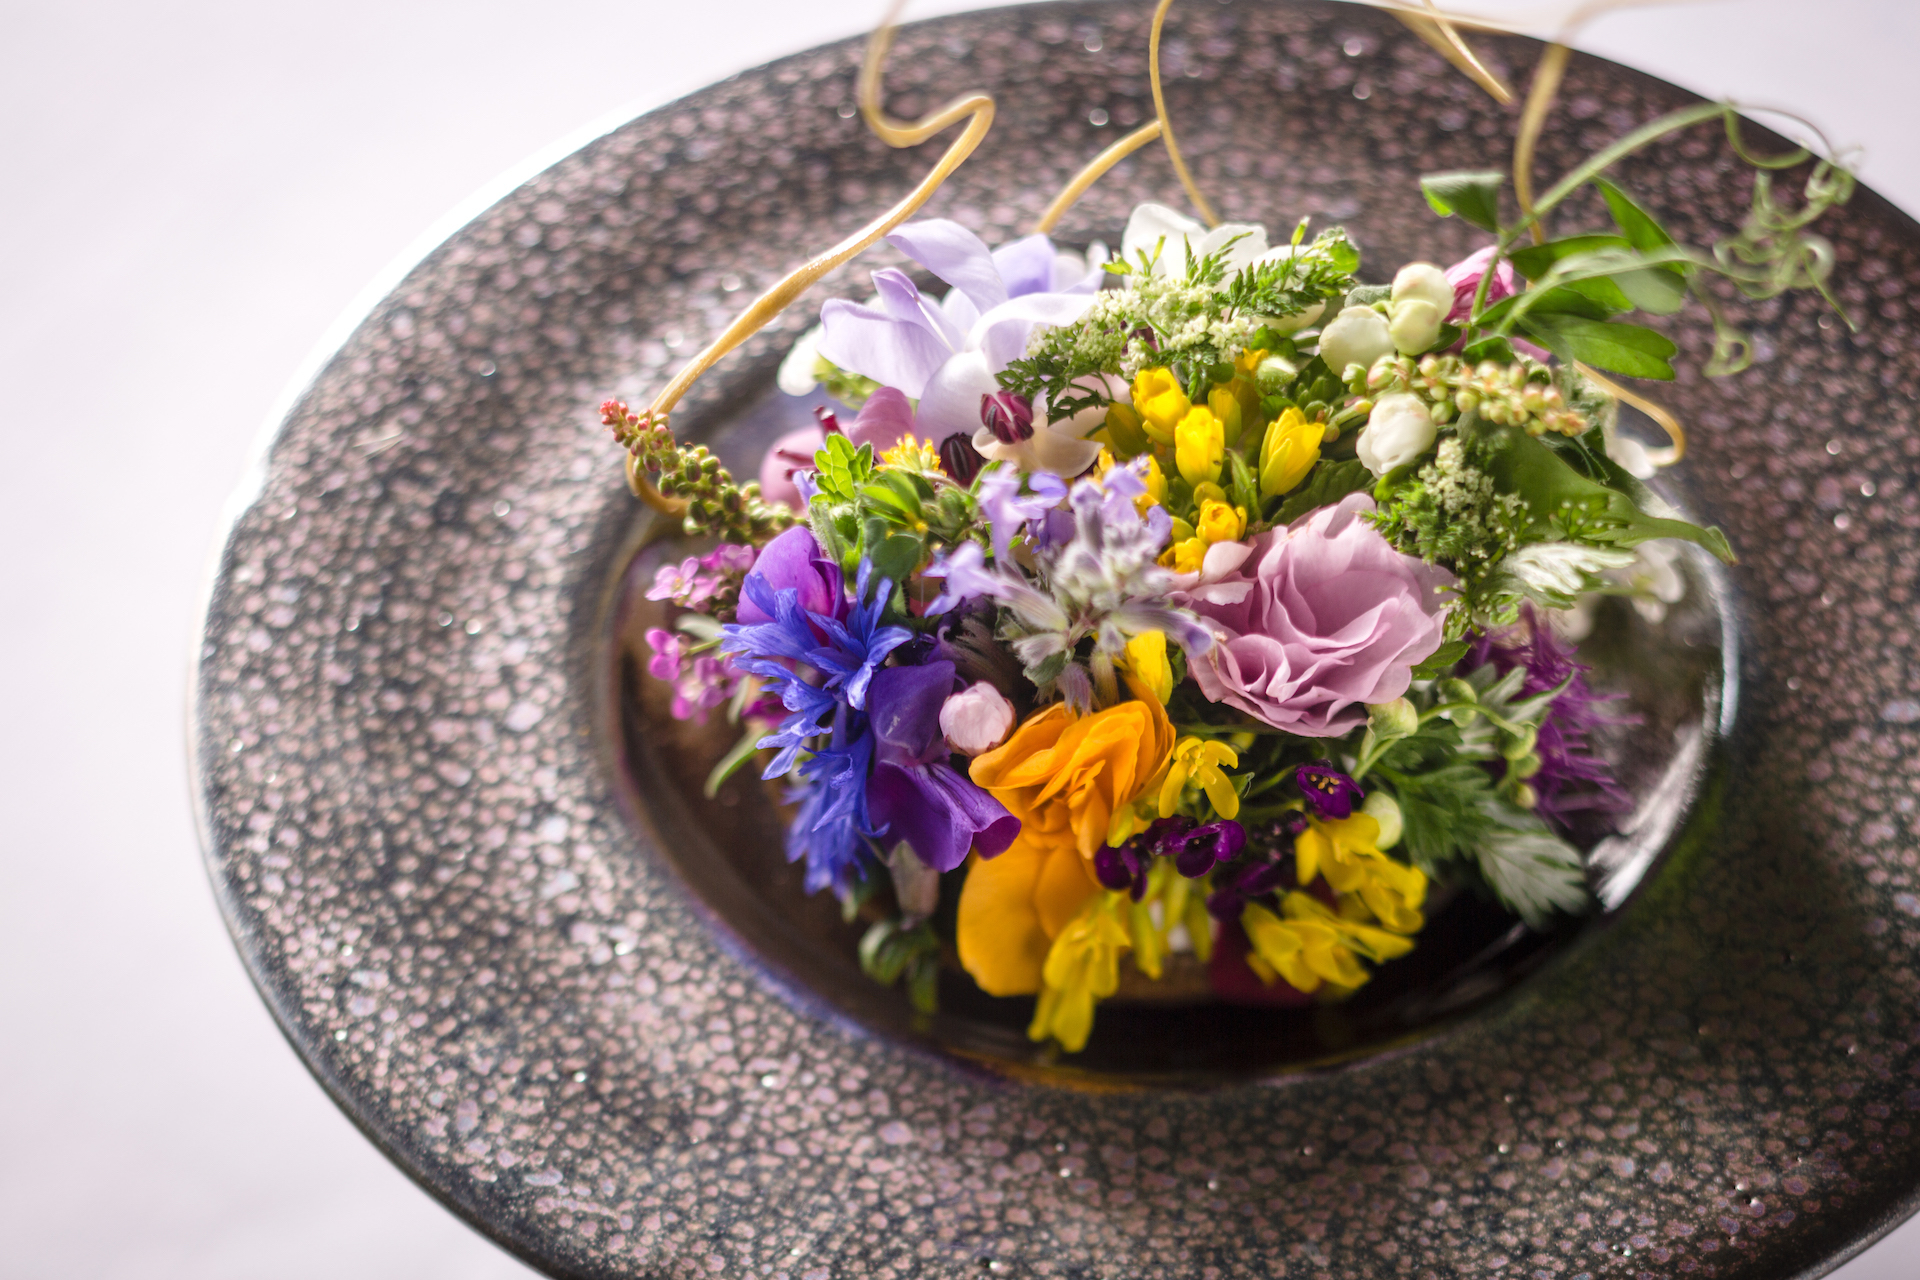 Best farm-to-table restaurants in Tokyo